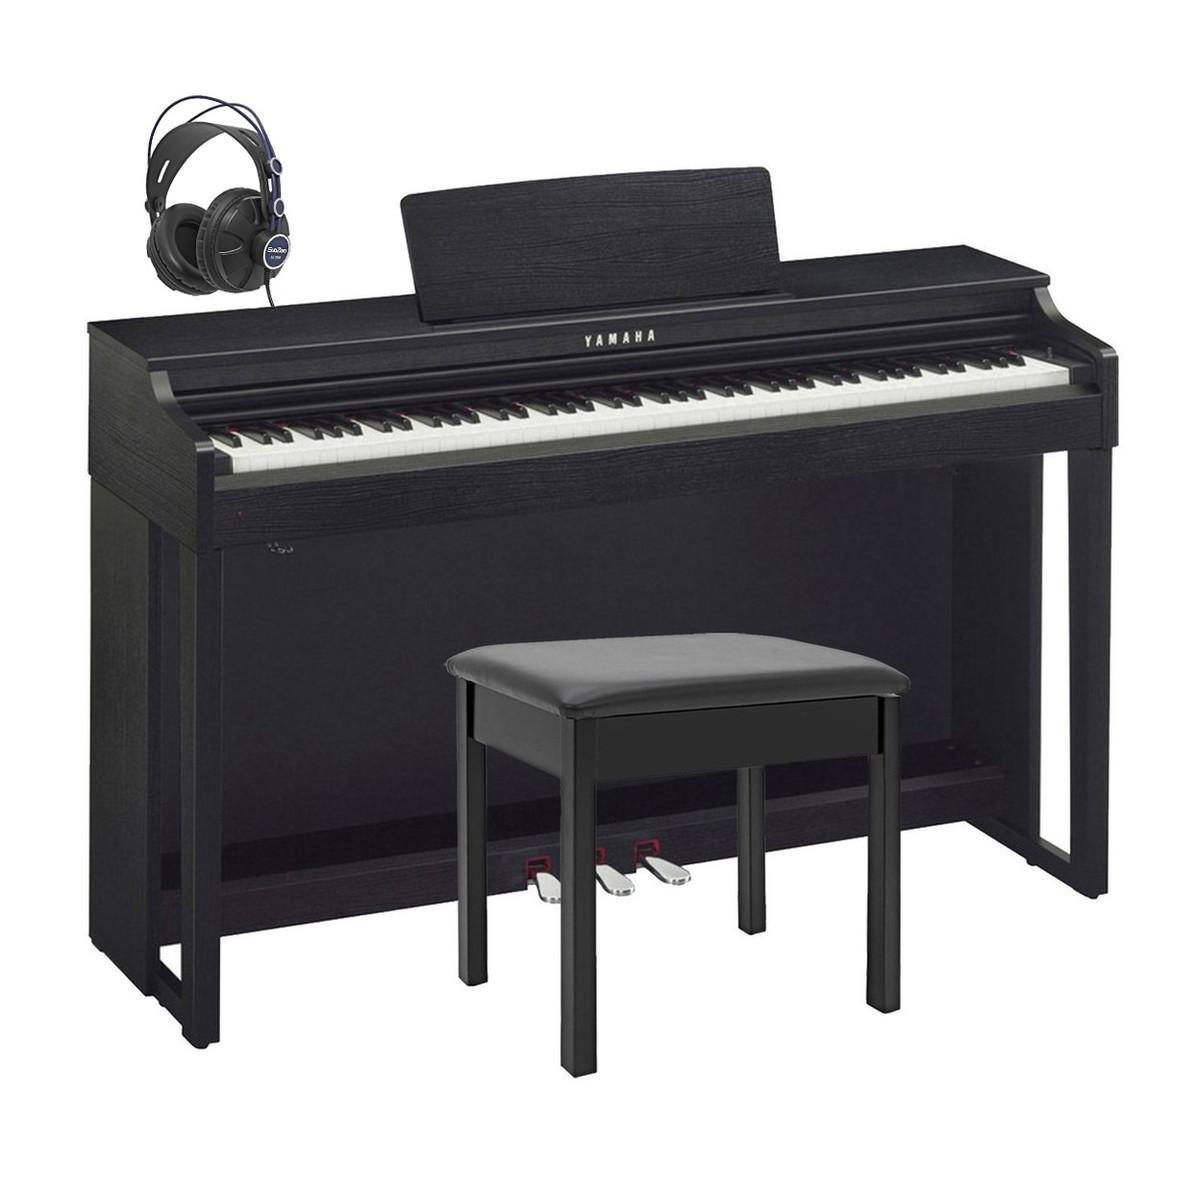 Yamaha clp525 clavinova digital piano package black for Yamaha digital piano clavinova